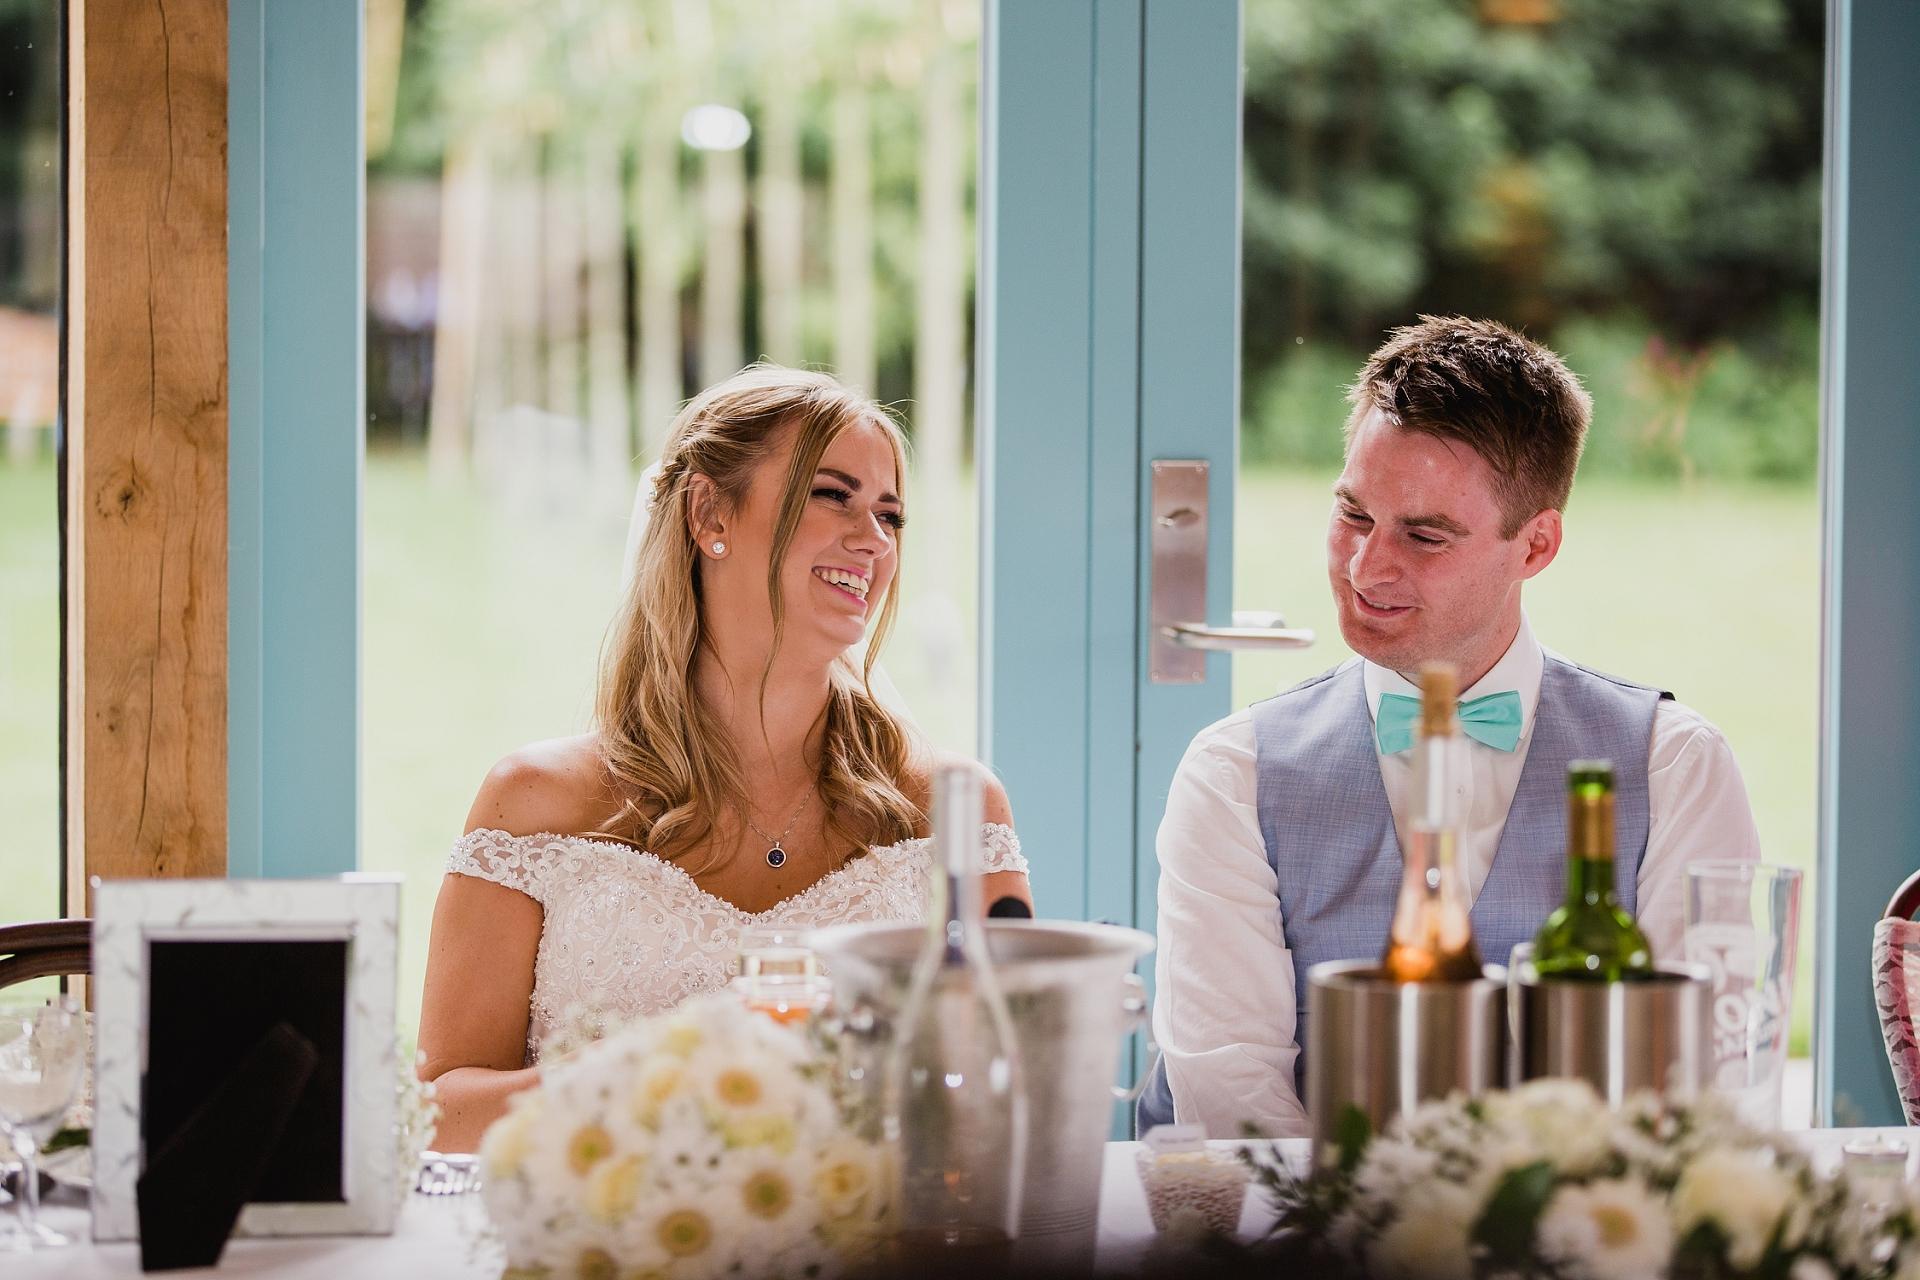 Wedding speaches at Hazel Gap Barn